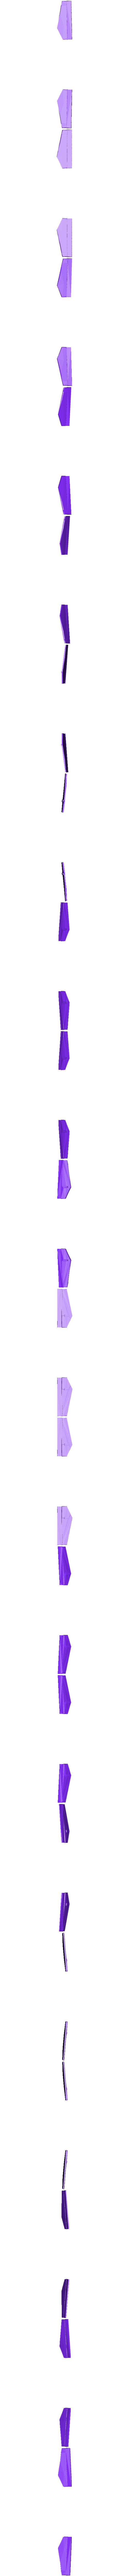 asurada-wing.STL Télécharger fichier STL KAZAMI HAYATO ASURADA CYBER FORMULE STATUE DIORAMA COURSE ANIME PERSONNAGE VOITURE DE COURSE • Plan à imprimer en 3D, figuremasteracademy